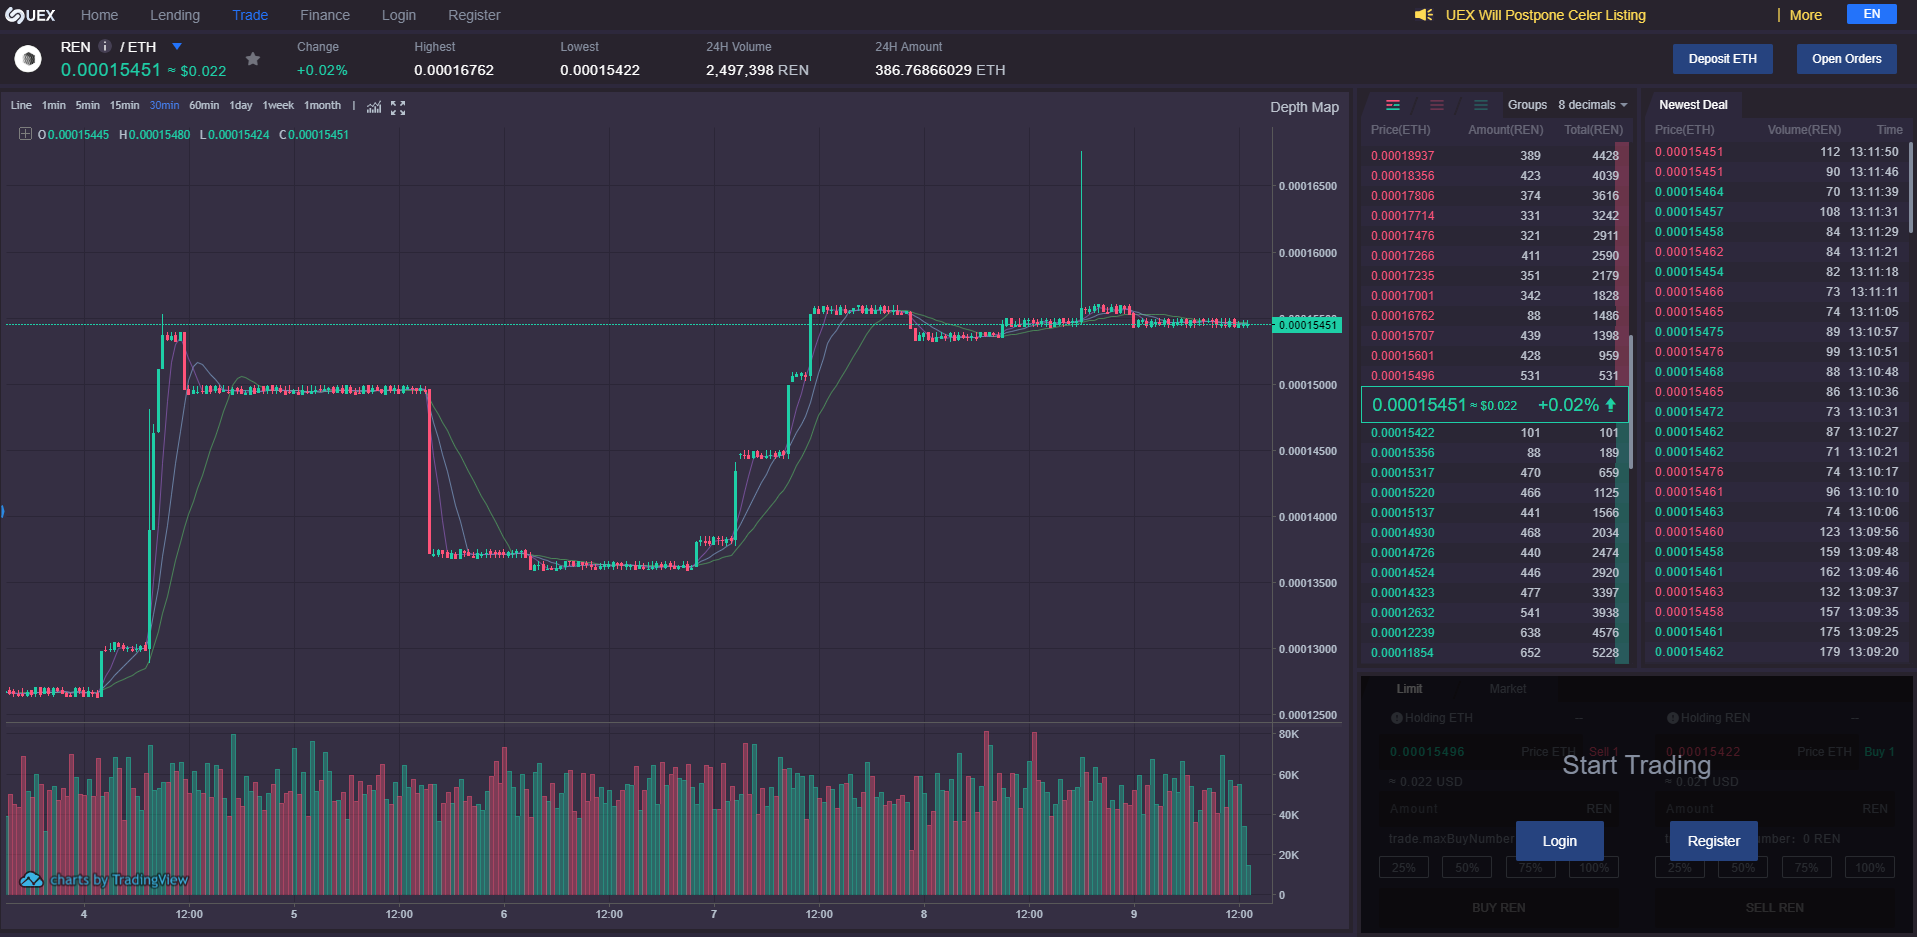 UEX Trading View